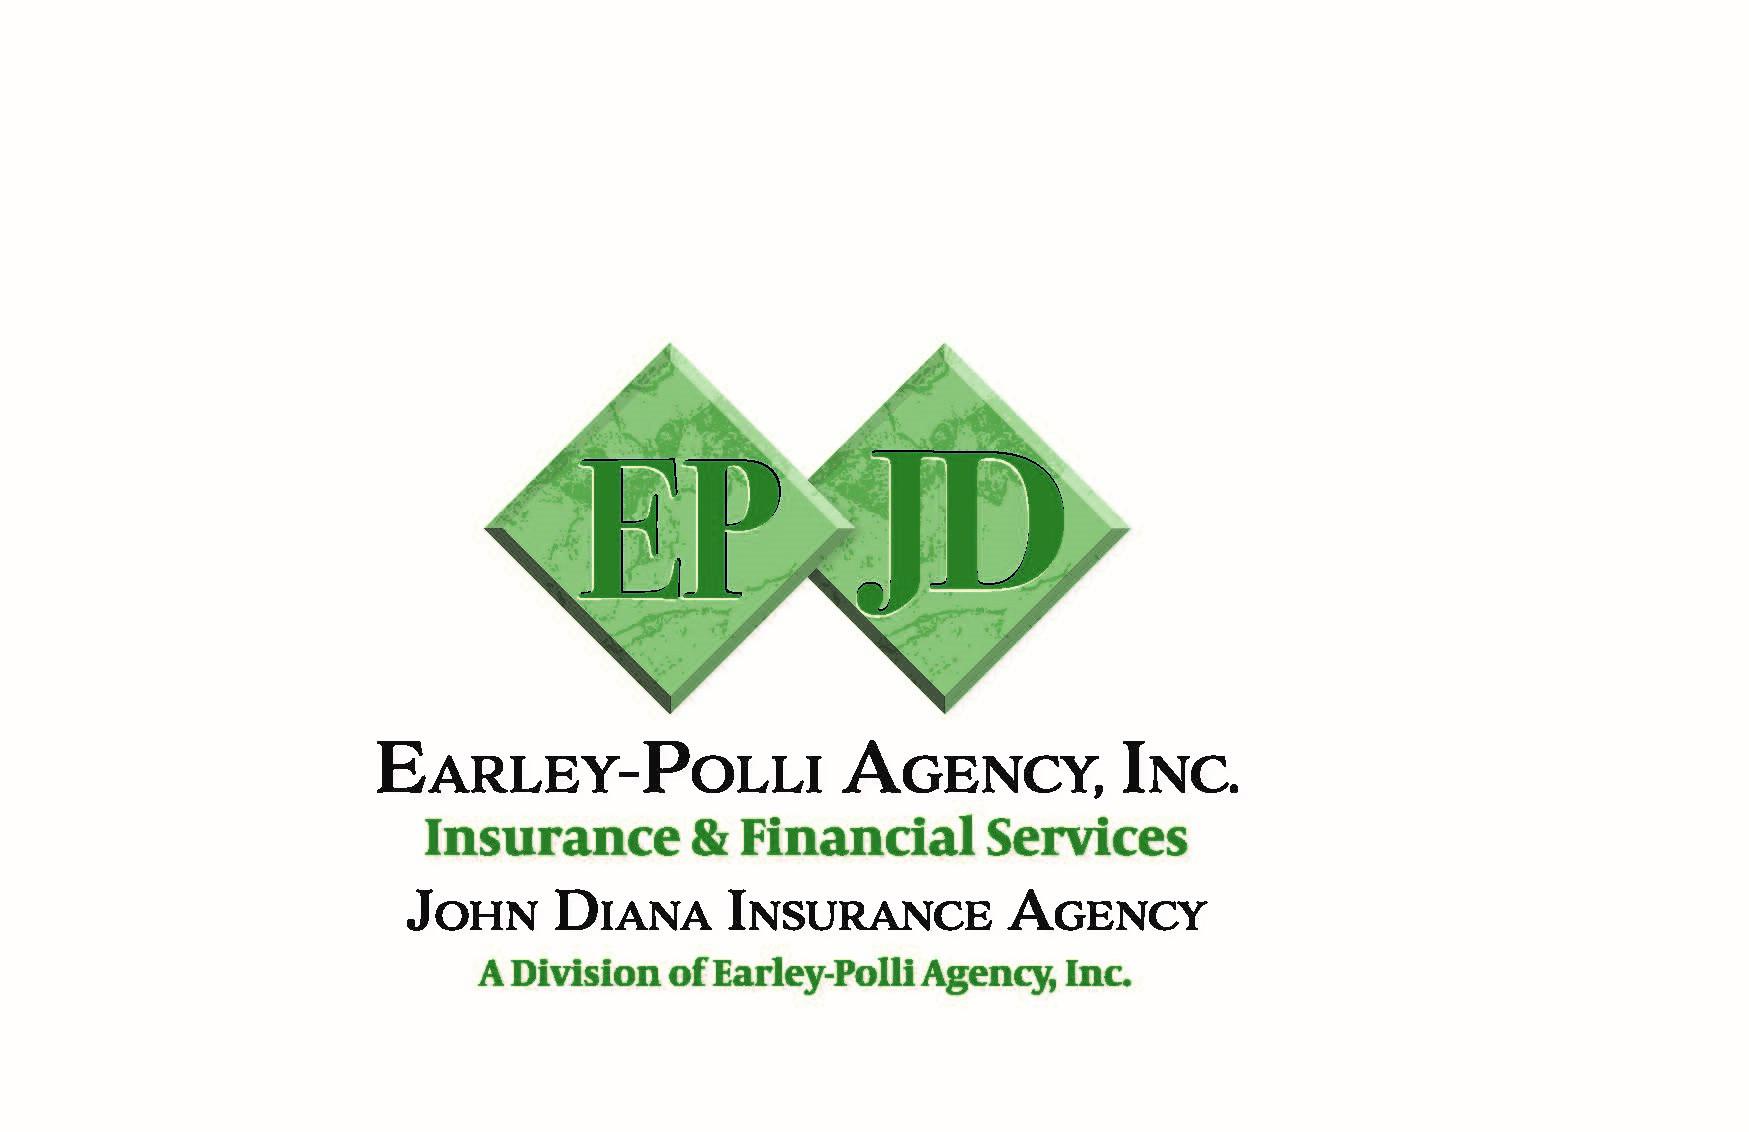 Earley Polli Agency